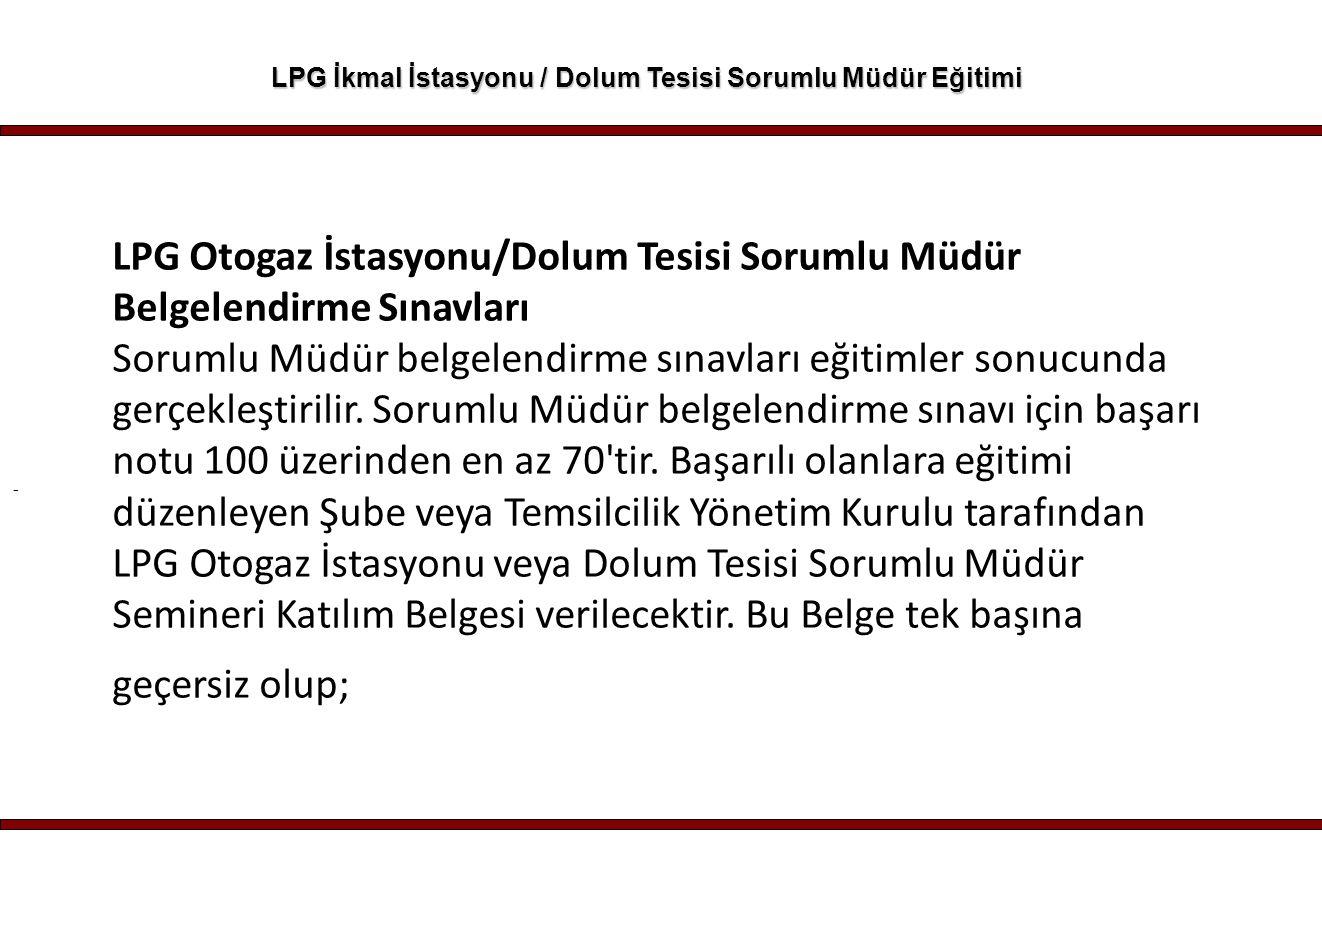 - LPG İkmal İstasyonu / Dolum Tesisi Sorumlu Müdür Eğitimi LPG Otogaz İstasyonu/Dolum Tesisi Sorumlu Müdür Belgelendirme Sınavları Sorumlu Müdür belge